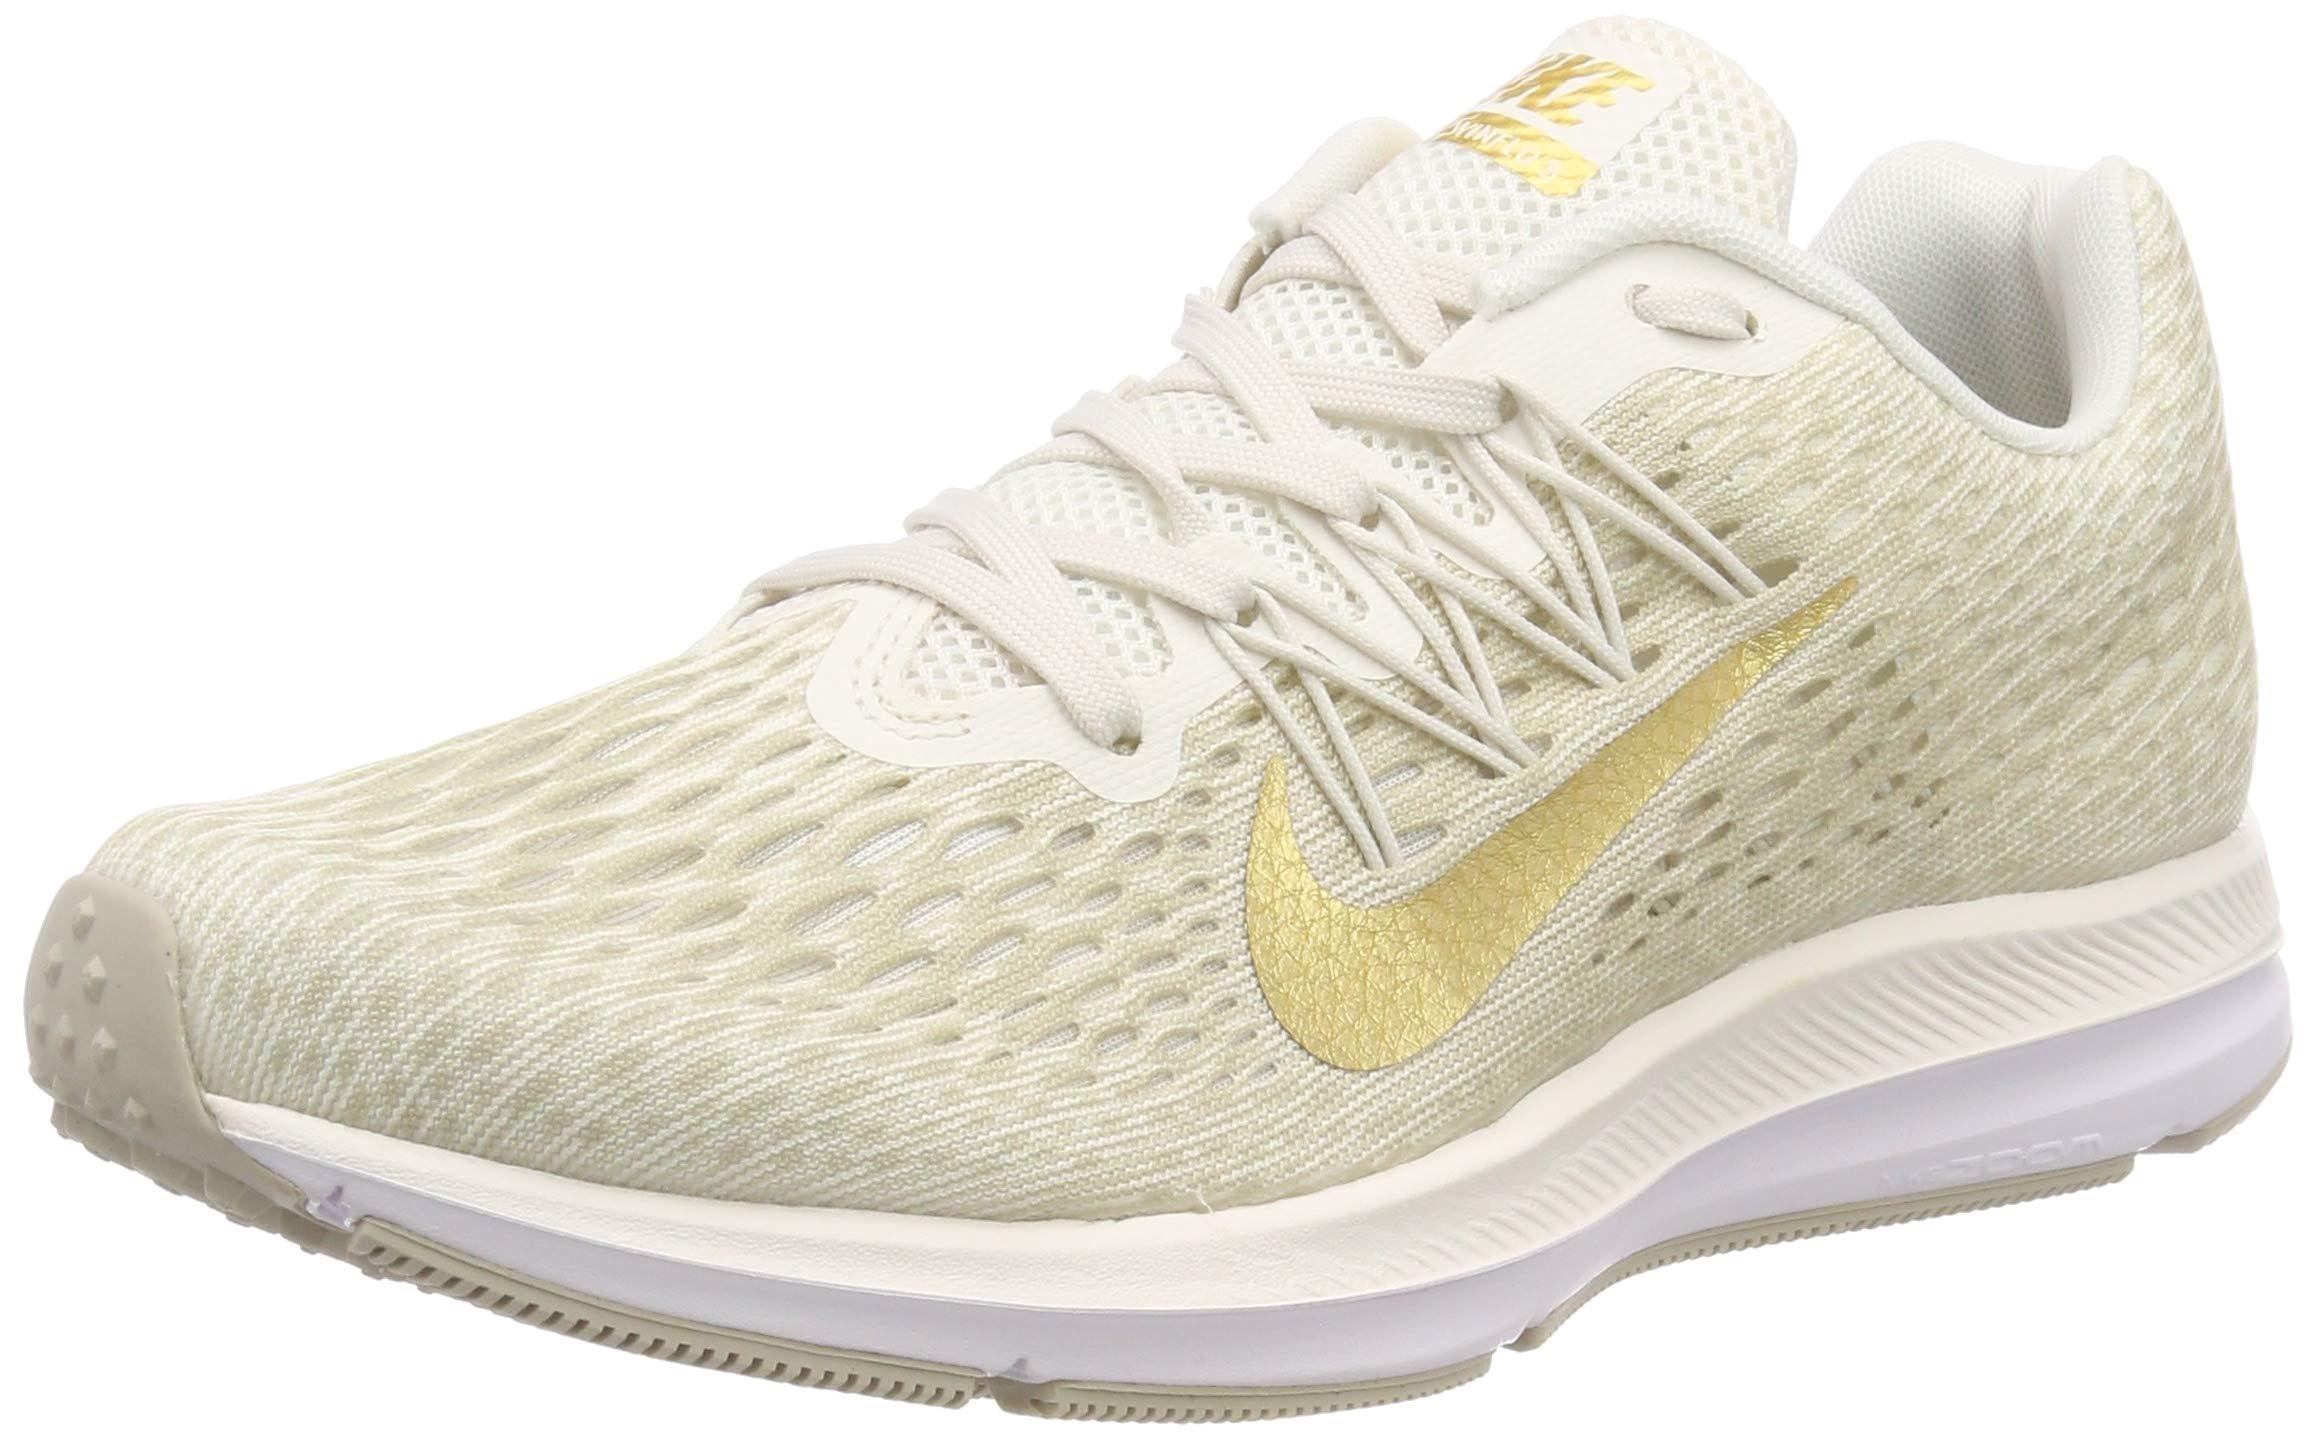 info for 08717 1a925 Nike Women's Air Zoom Winflo 5 Running Shoe, Phantom/Metallic  Gold-String-White, 9.5